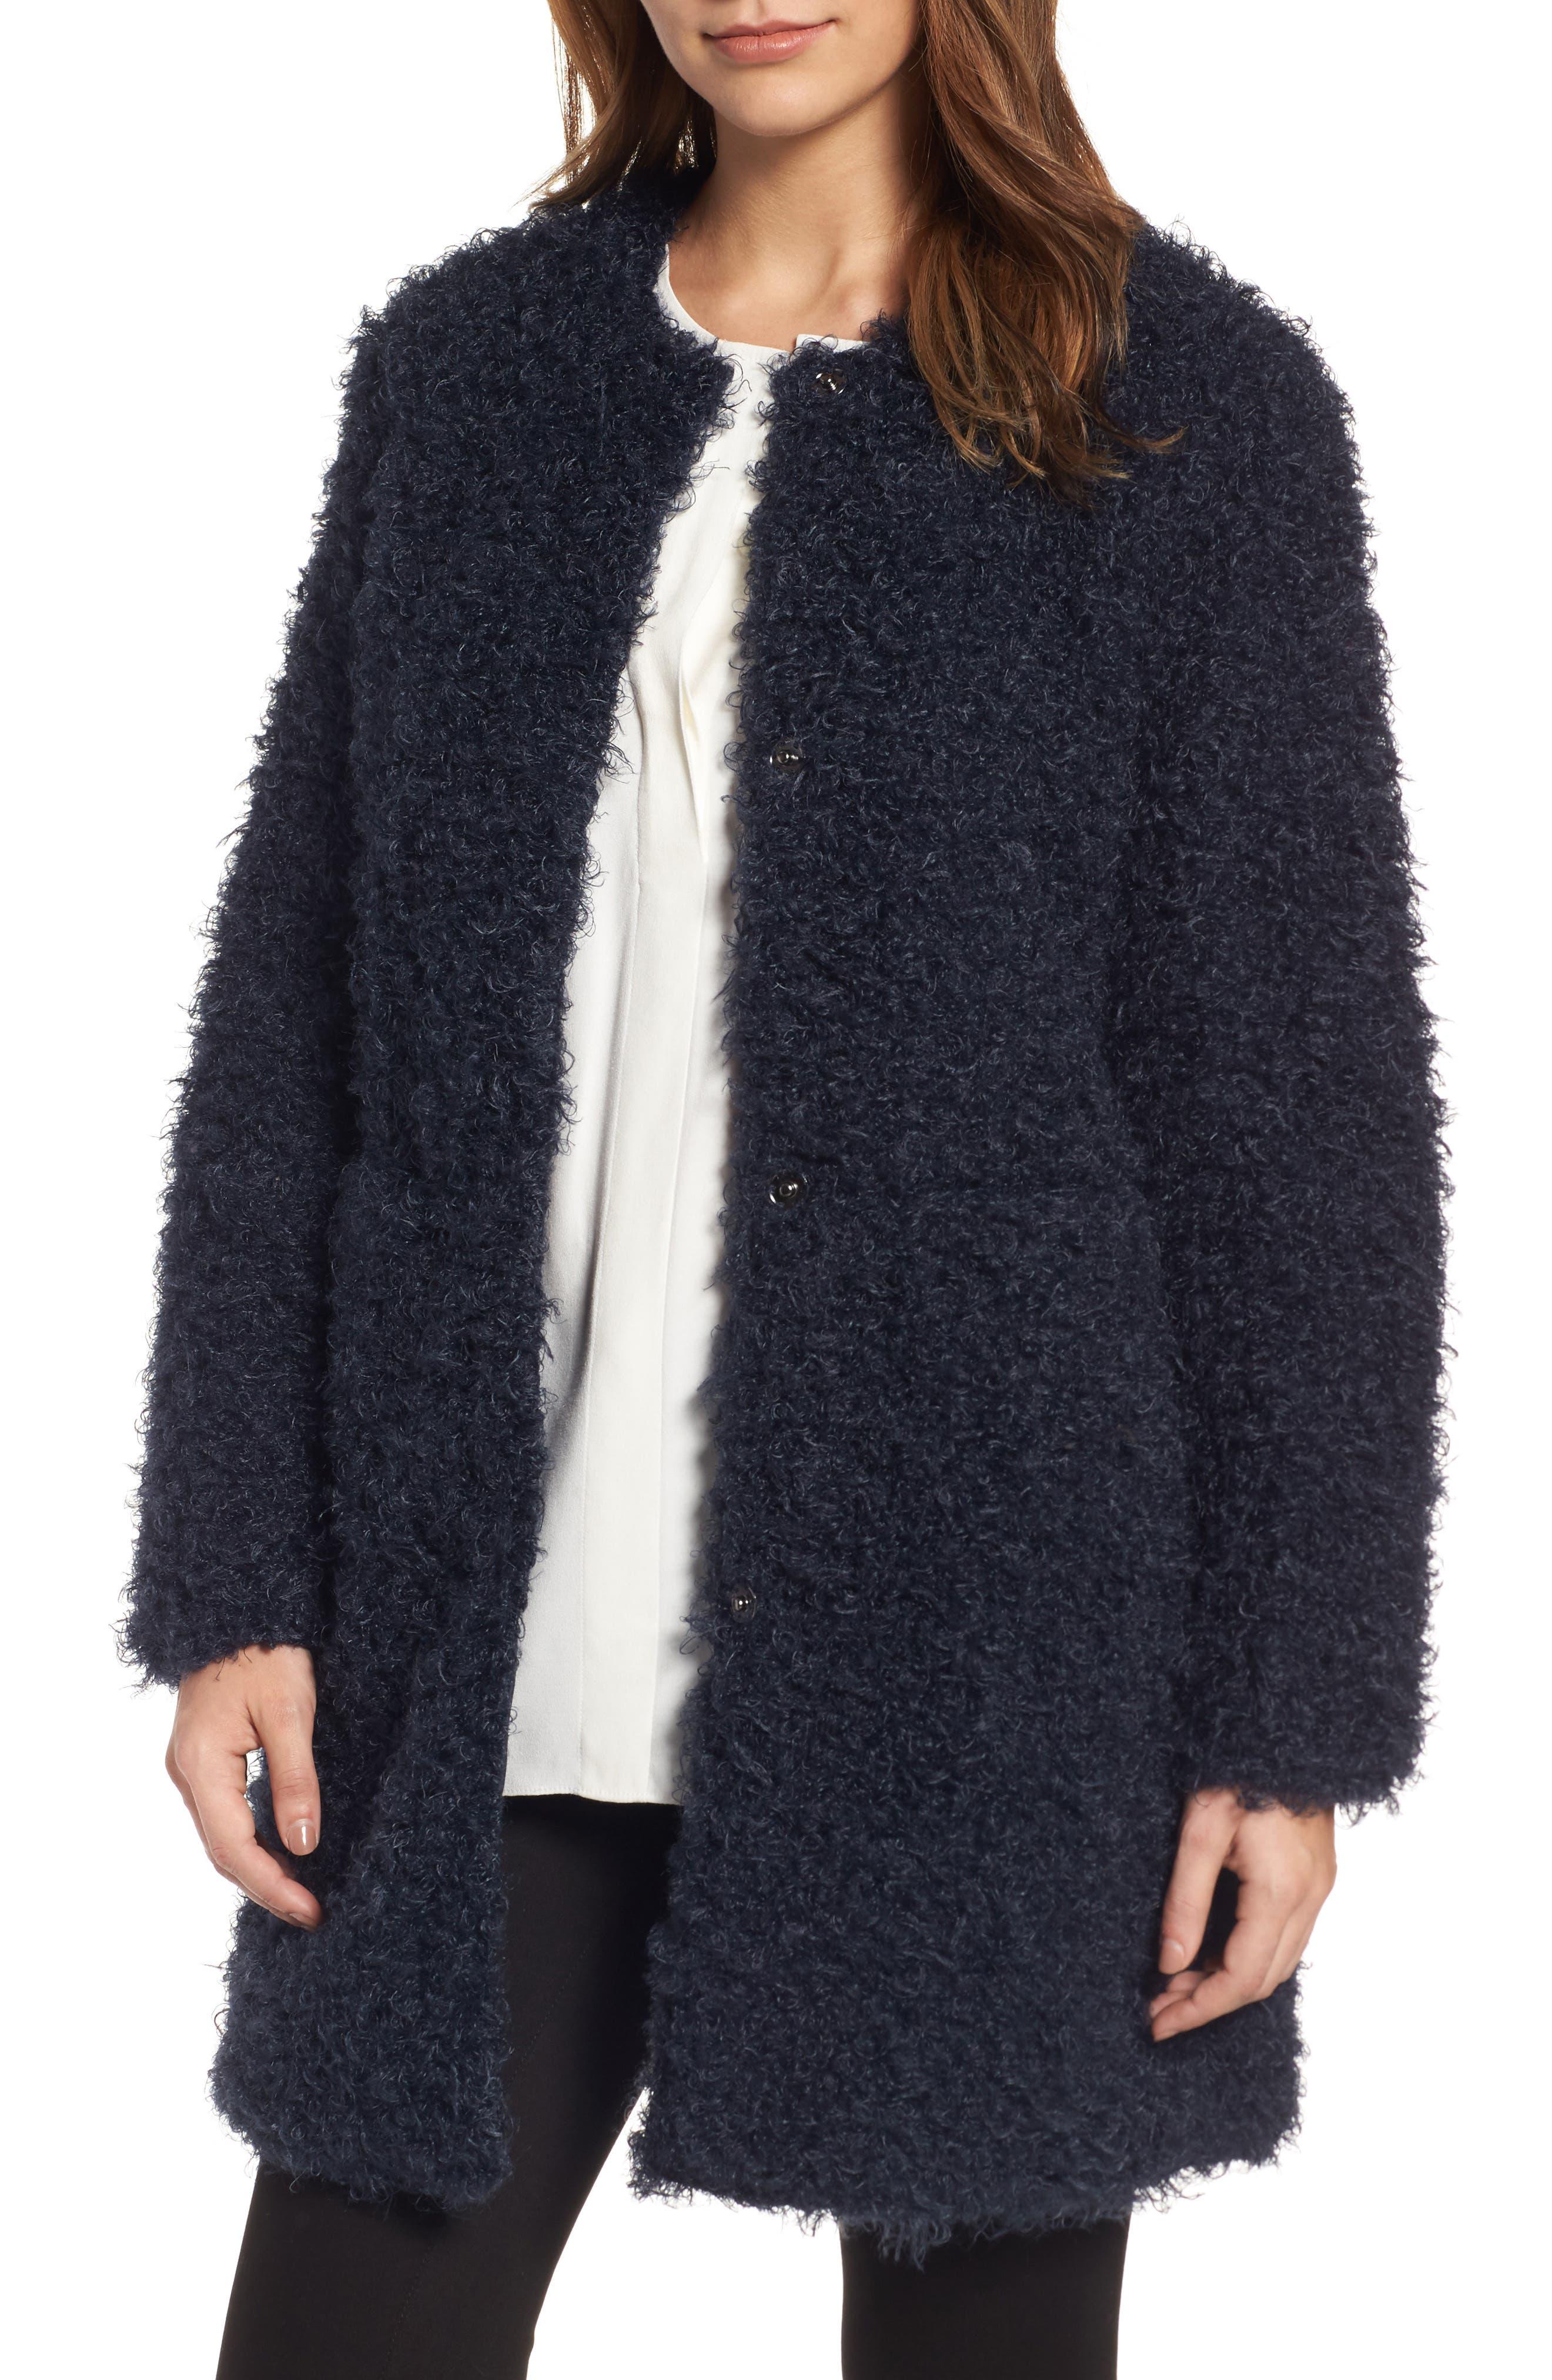 Reversible Faux Fur Coat,                             Main thumbnail 1, color,                             Navy